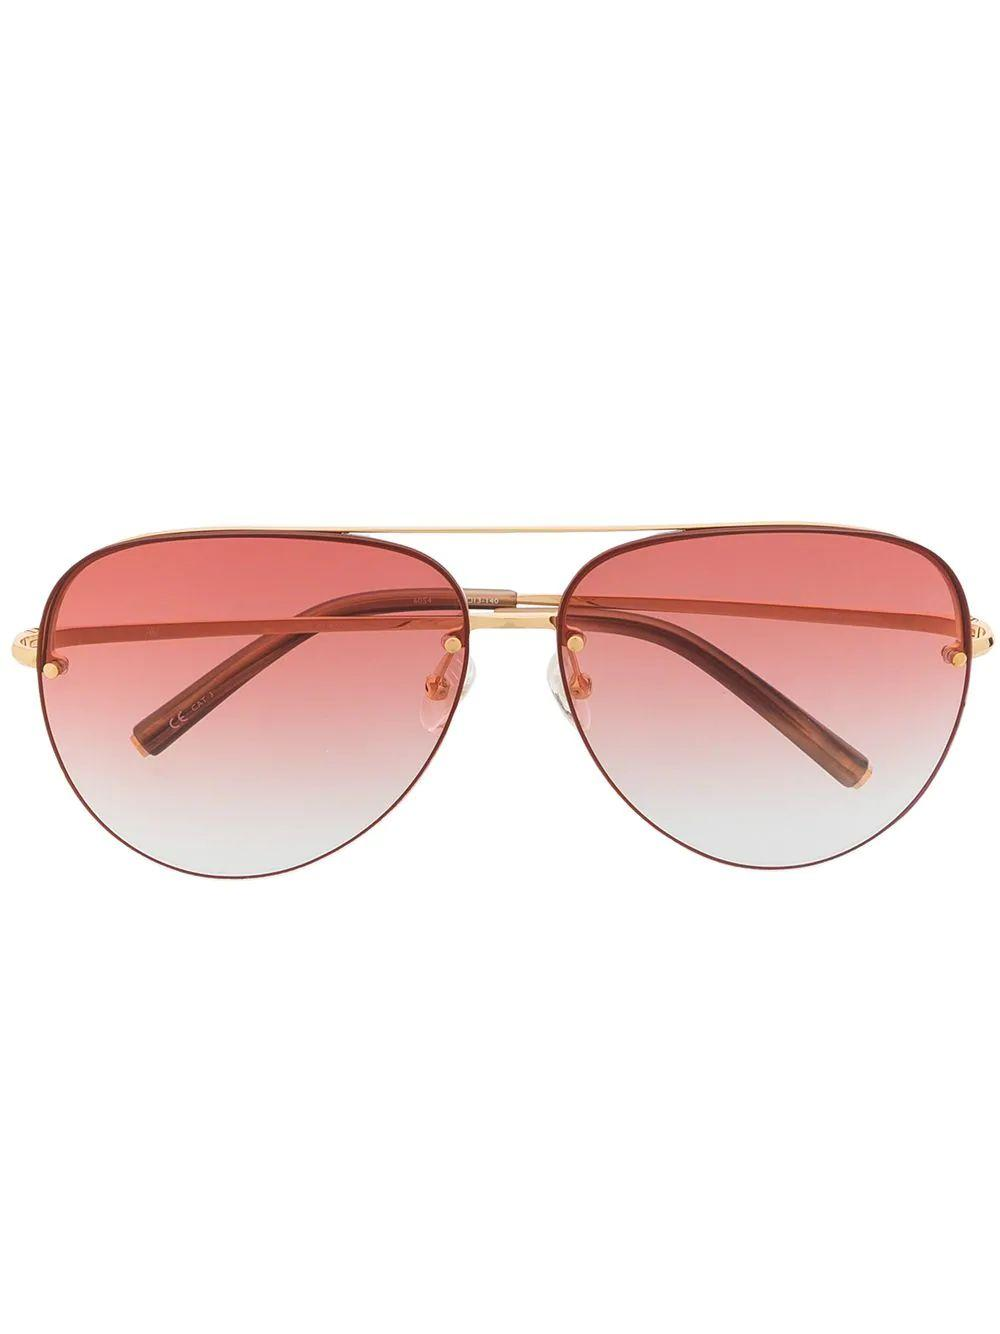 Clover Aviator Sunglasses Item # MW240C4SUN